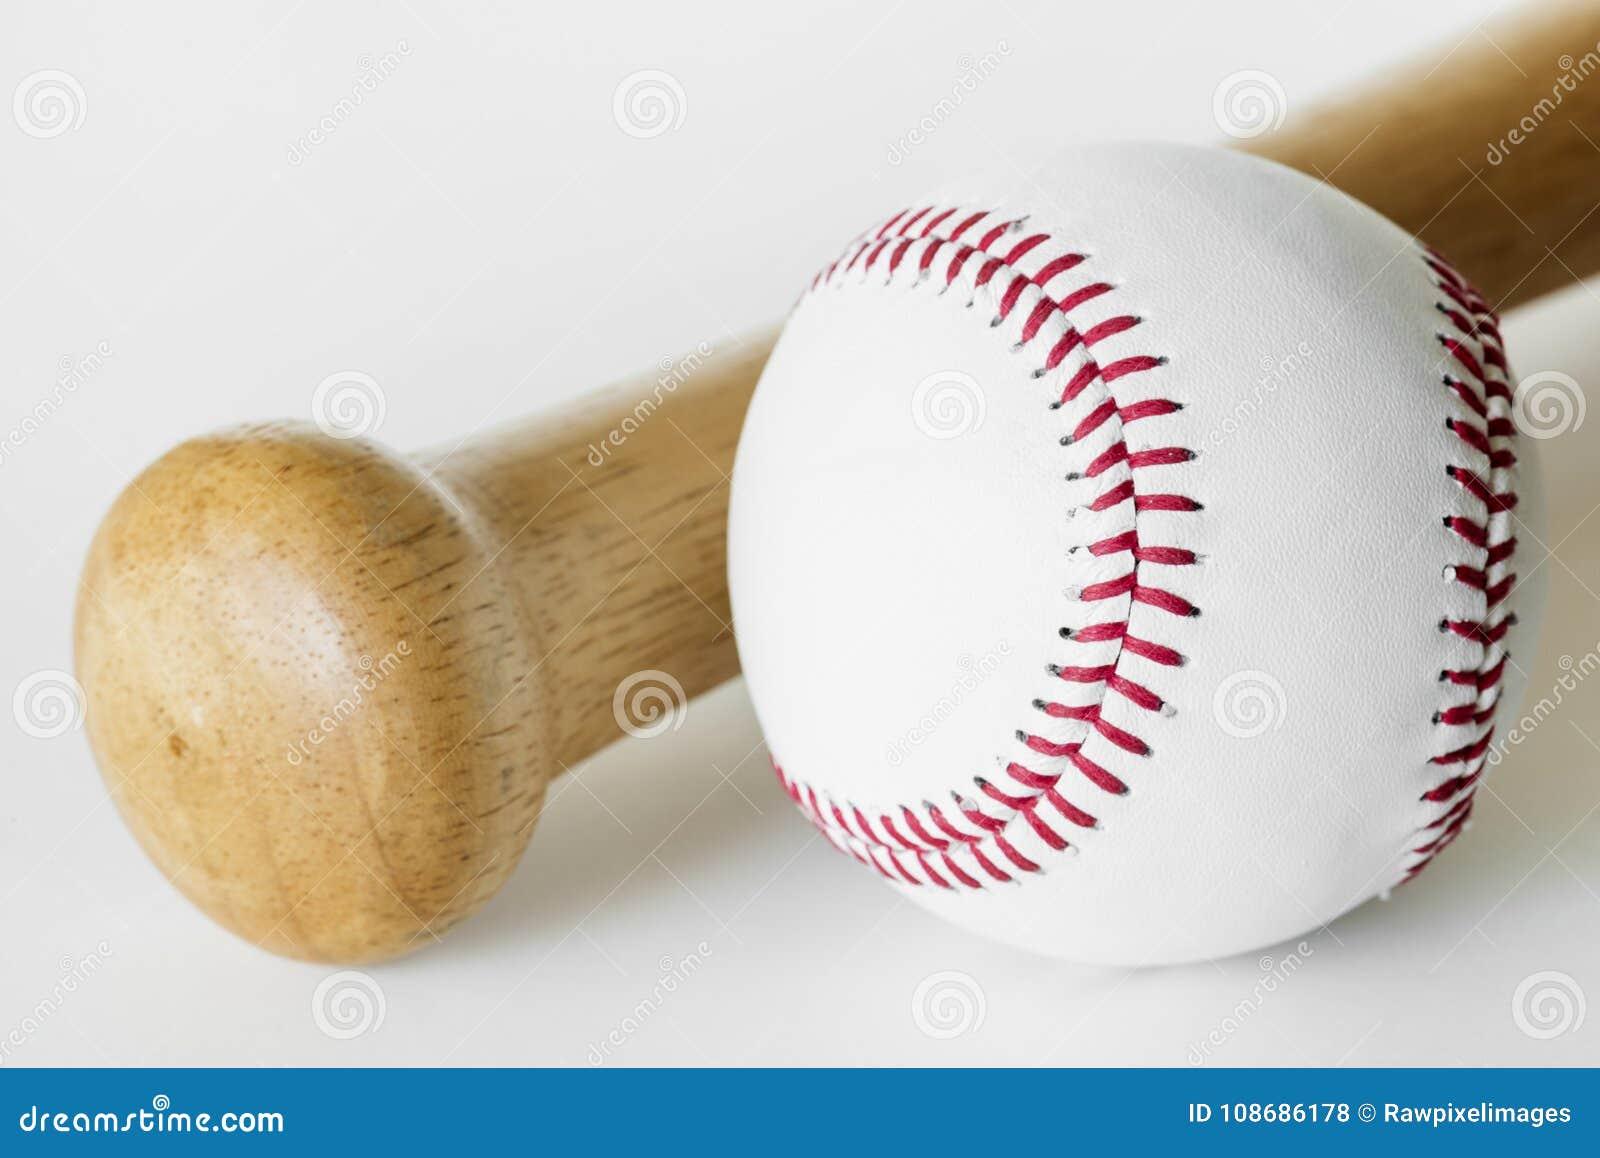 Closeup of baseball and bat